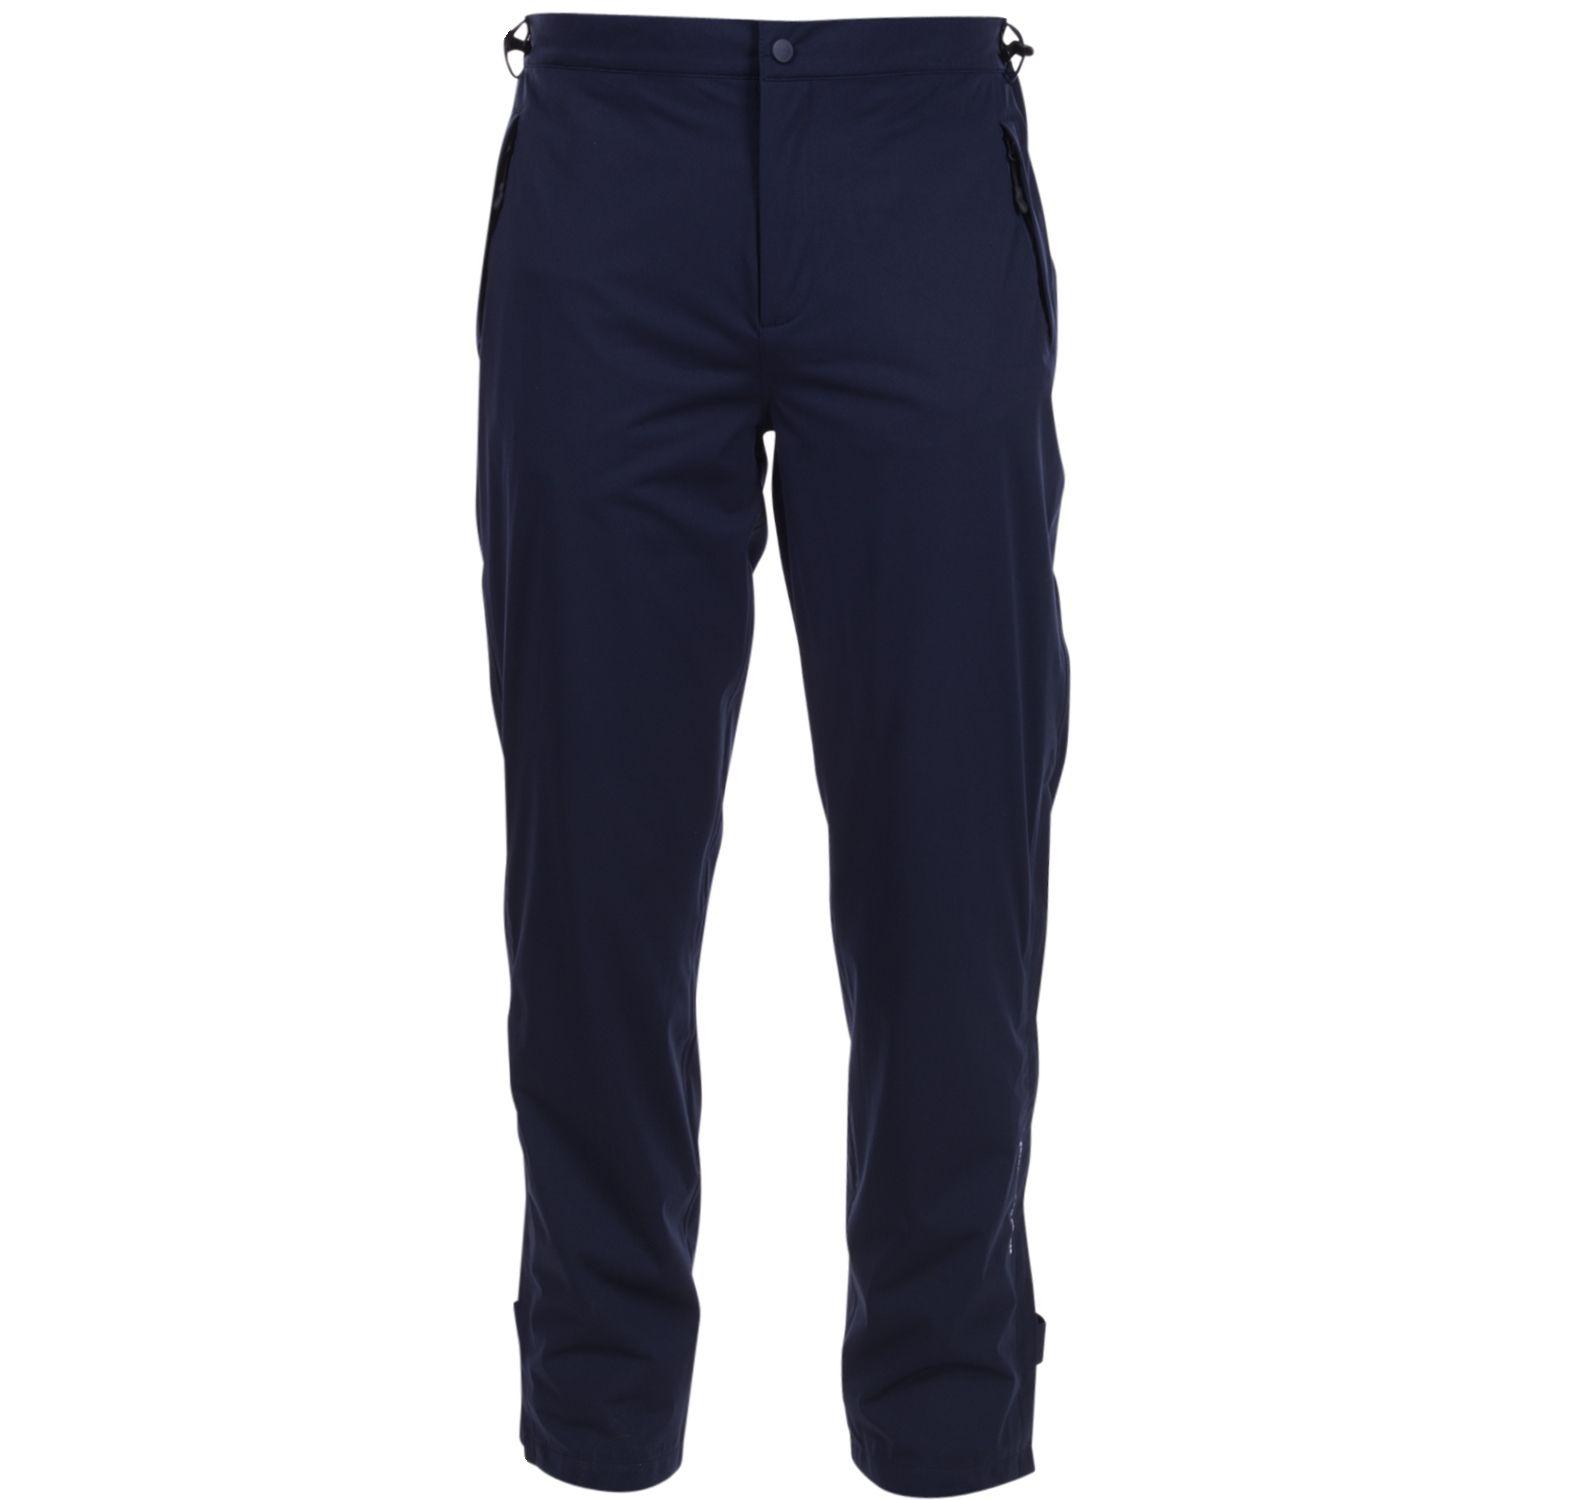 On Course Pants, Dk Navy, 2xl, Regnkläder